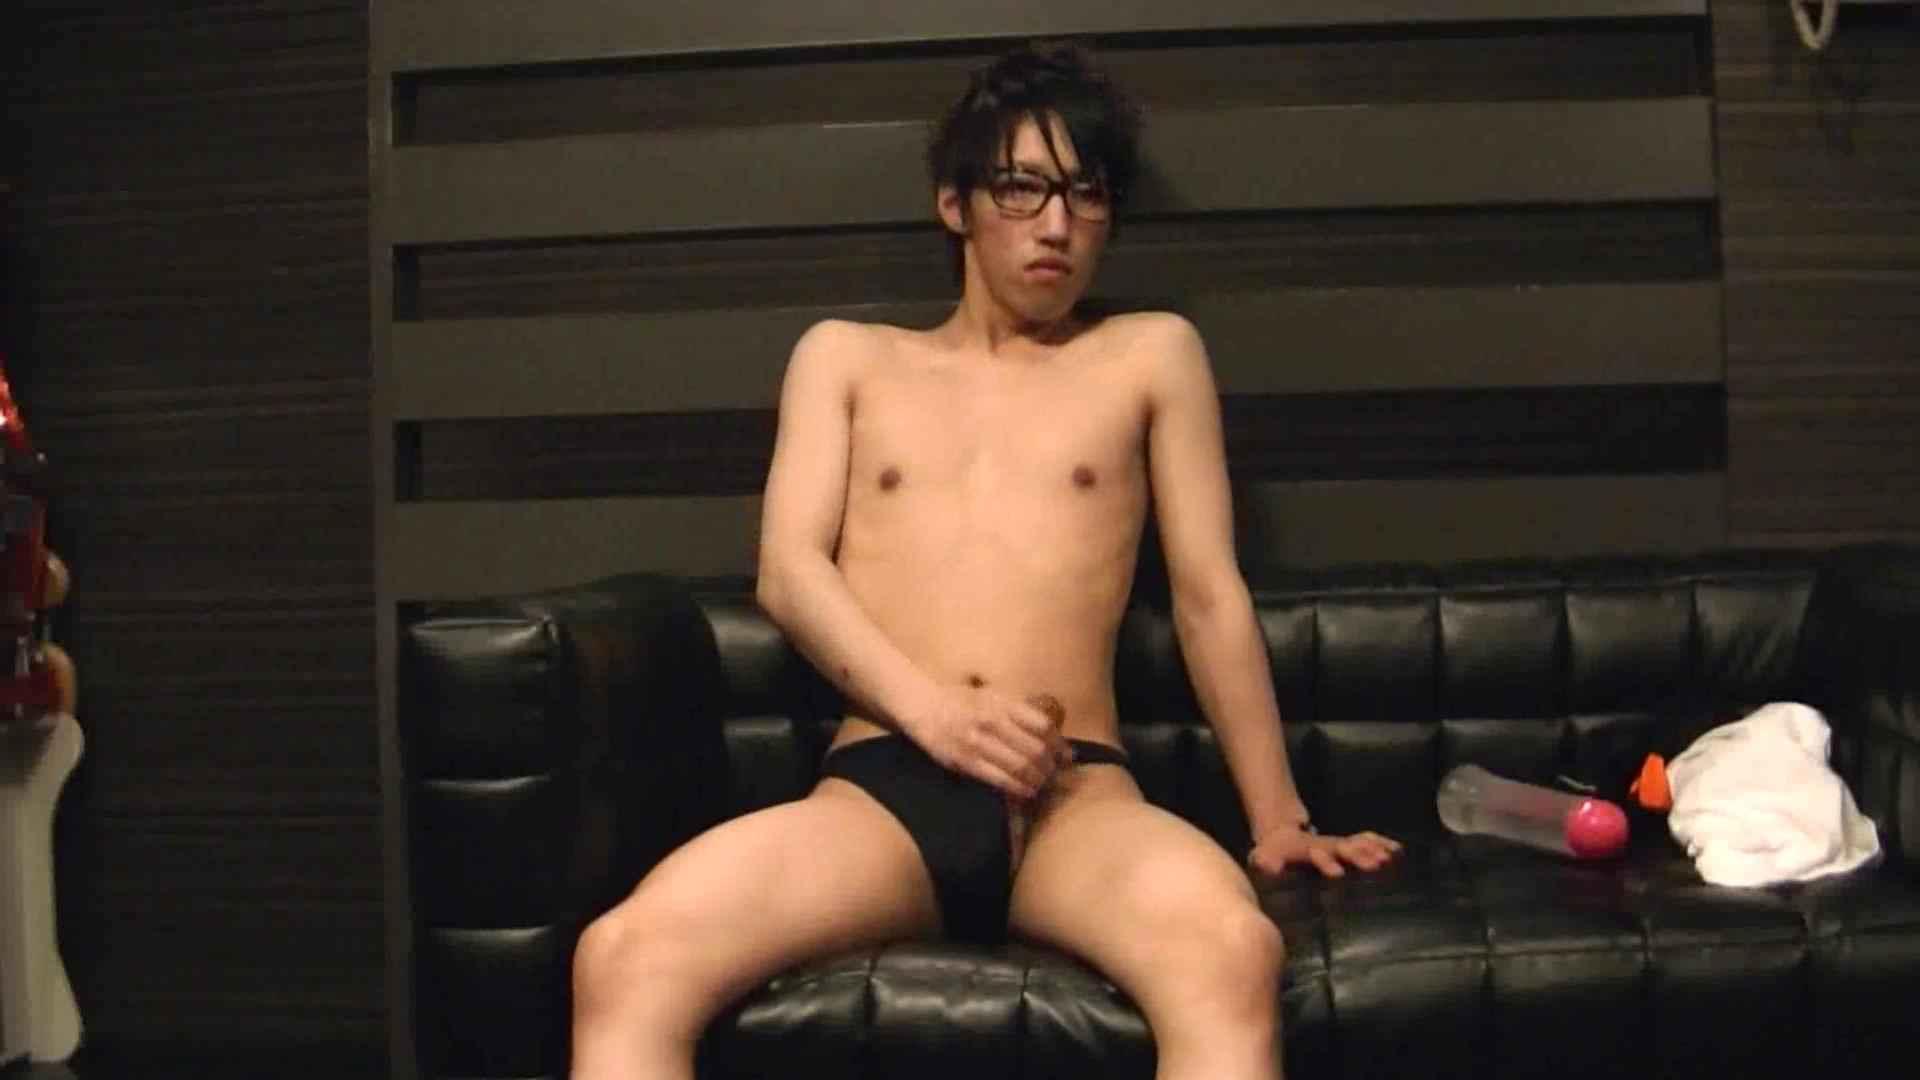 ONA見せカーニバル!! Vol3 男  93pic 35